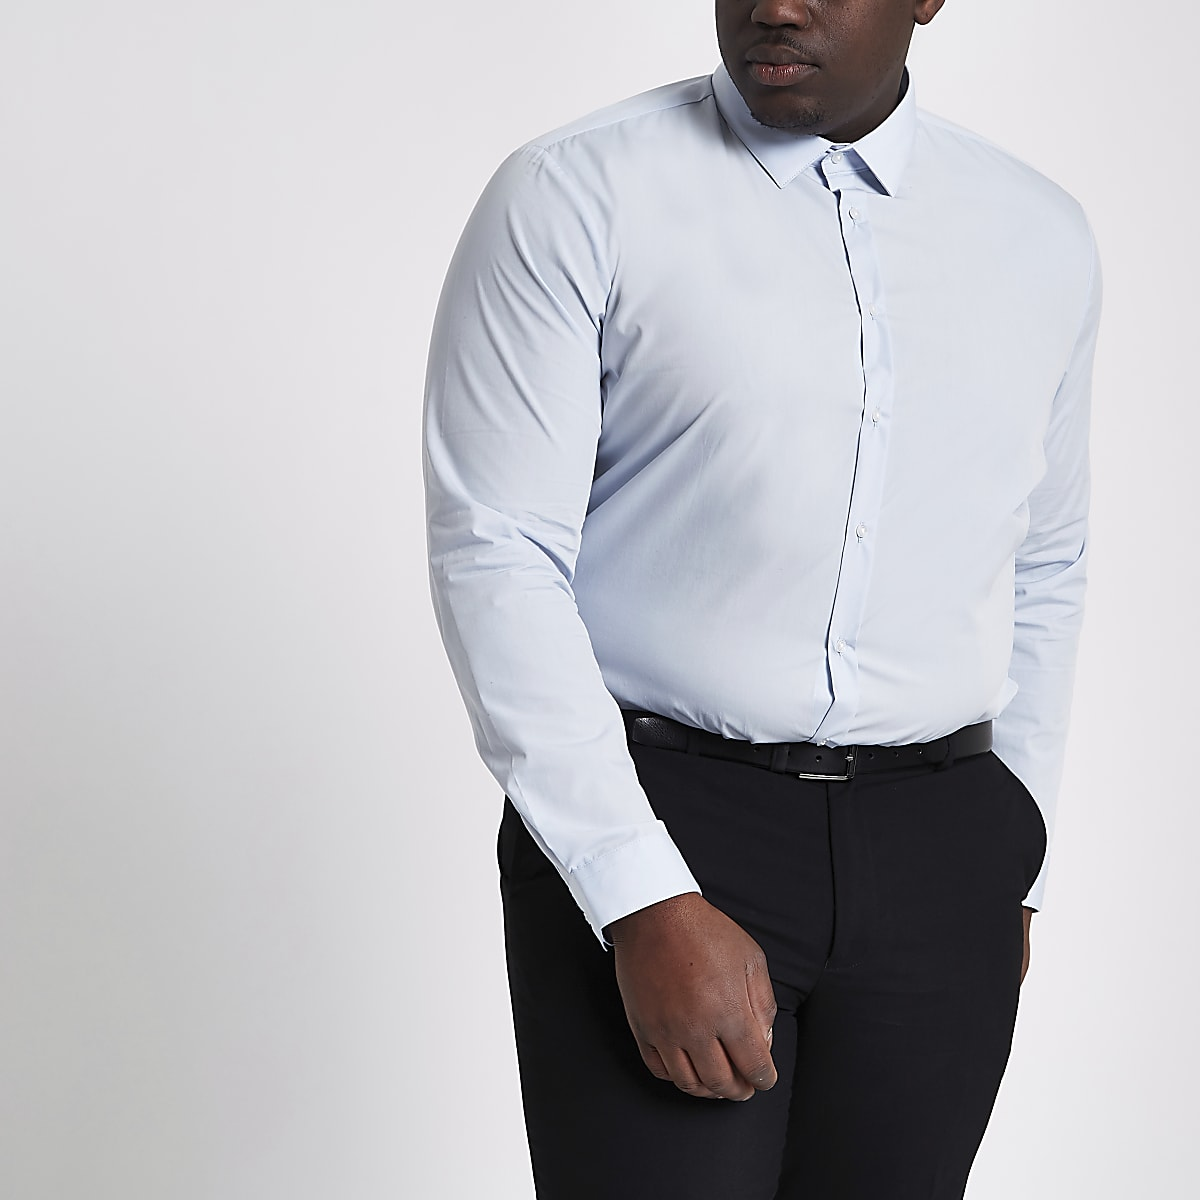 Lichtblauw Overhemd.Big And Tall Lichtblauw Overhemd Met Lange Mouwen Overhemden Met